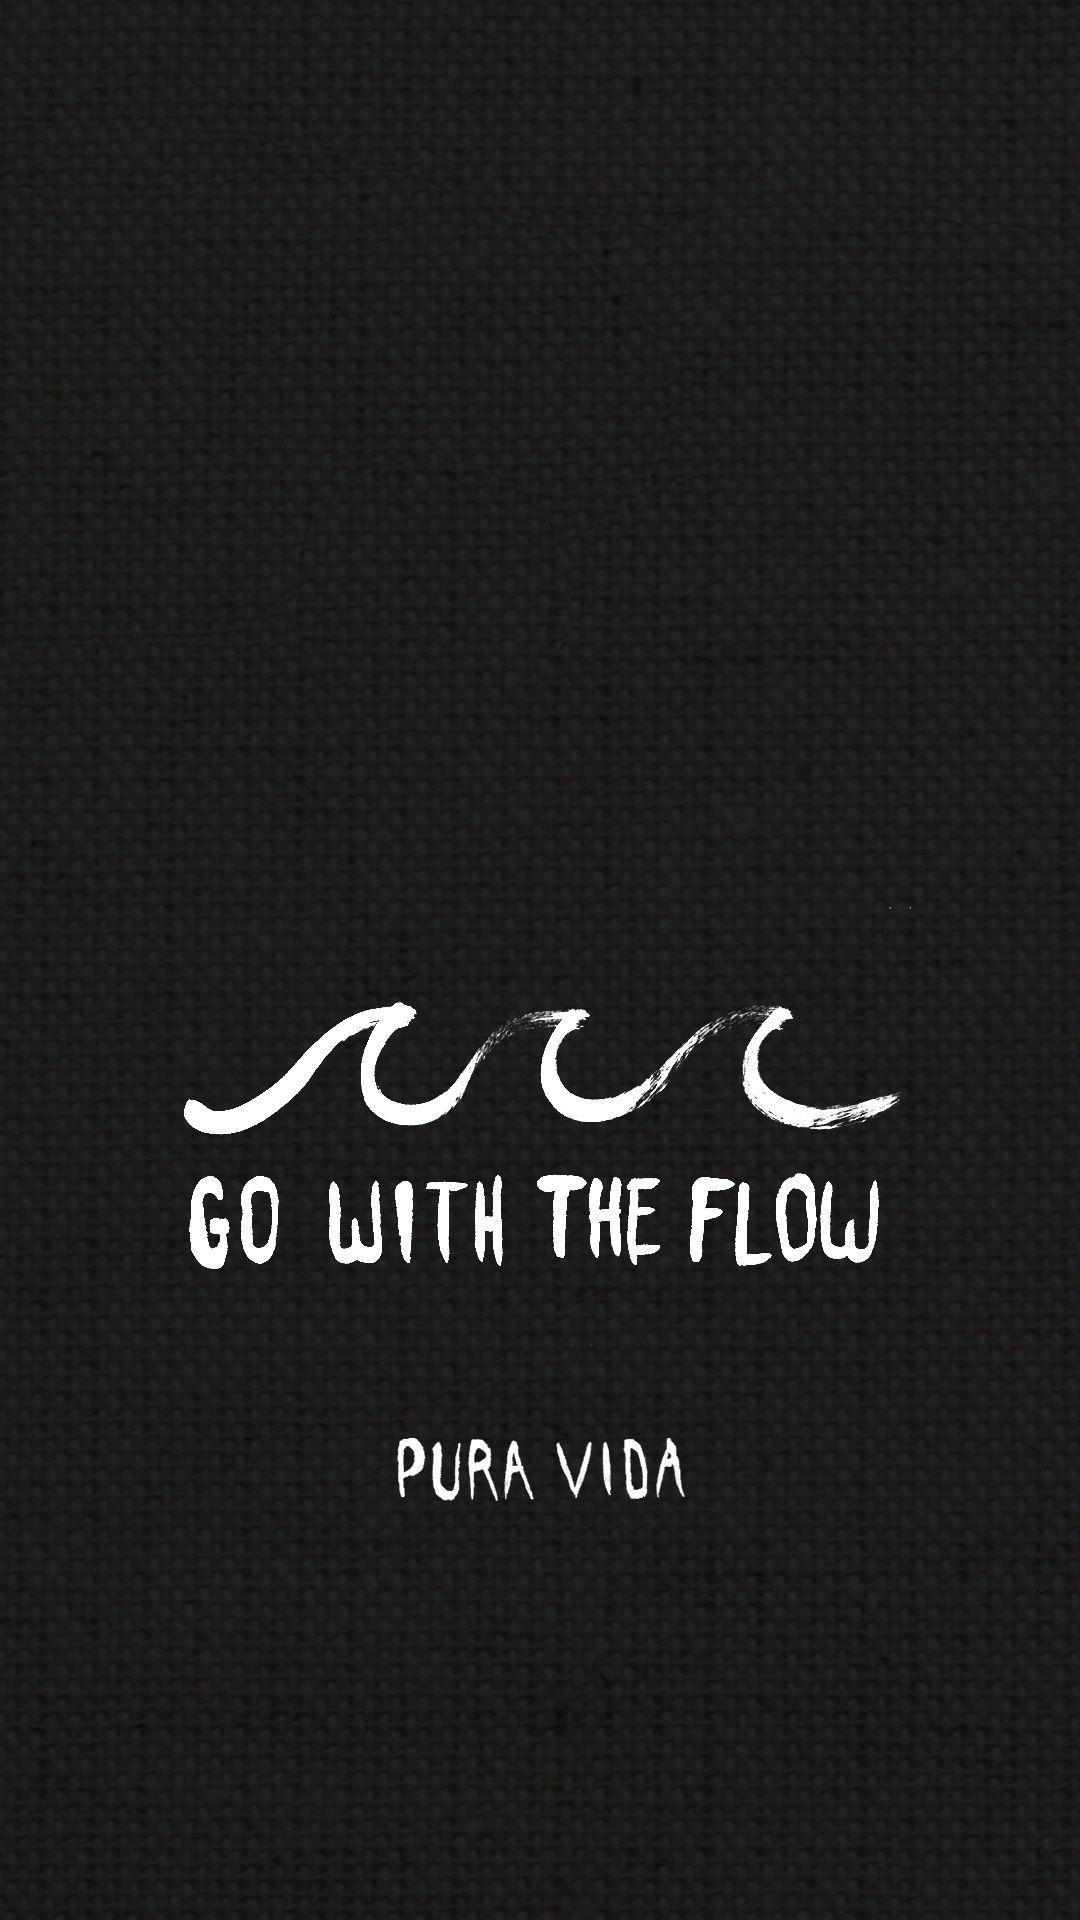 Go with the flow from Pura Vida Bracelets